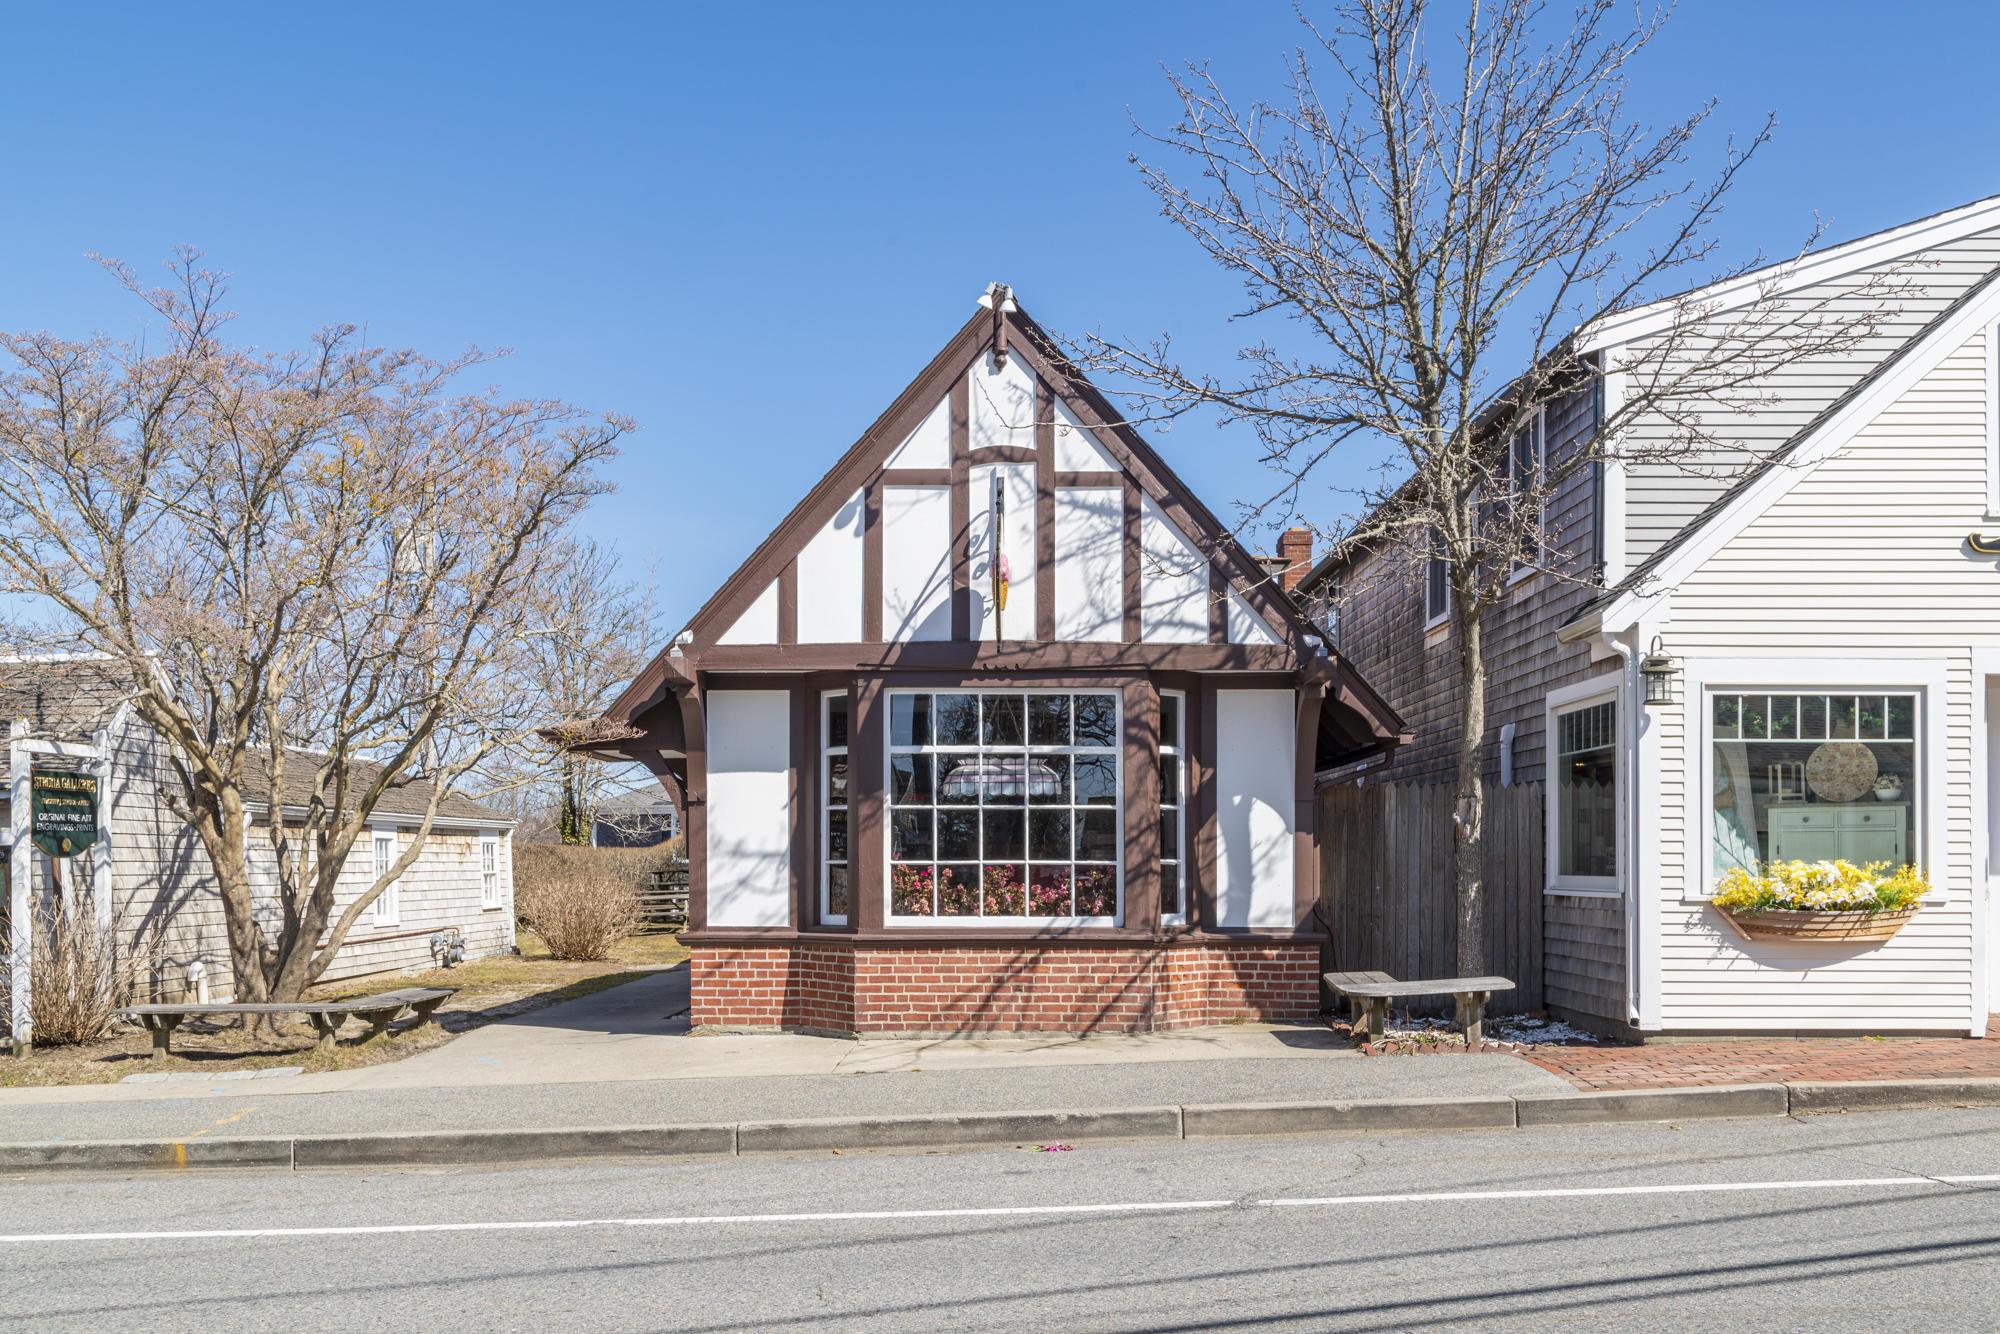 456 Main Street, Chatham, MA  02633 - slide 9